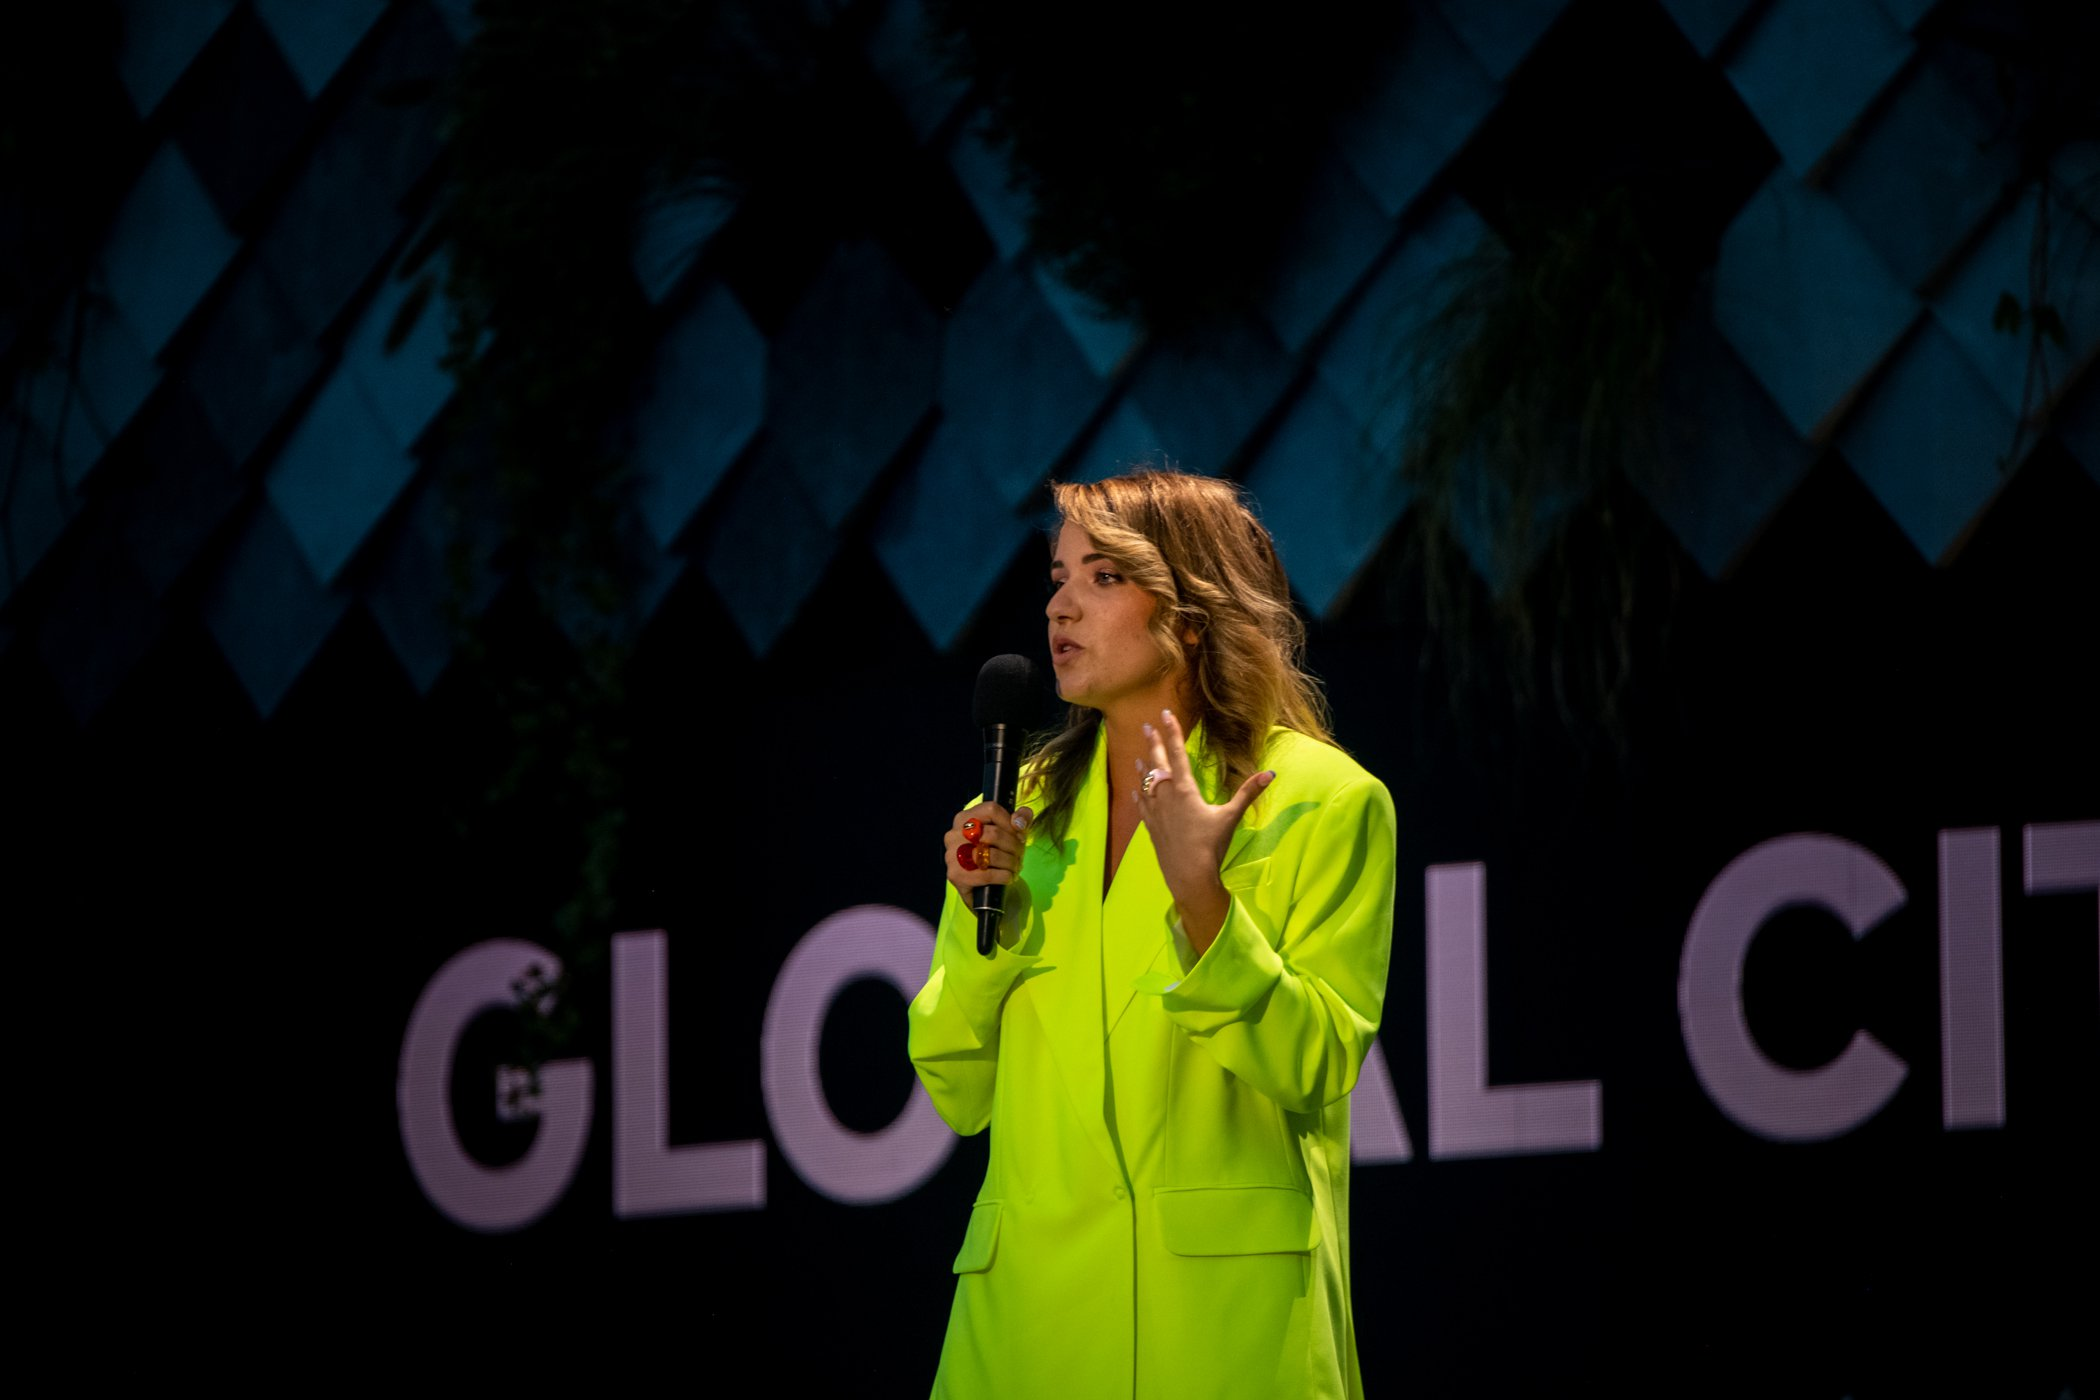 GCL_Paris_LouiseAubery_AnneCharlotteCompanforGlobalCitizen-01.jpg